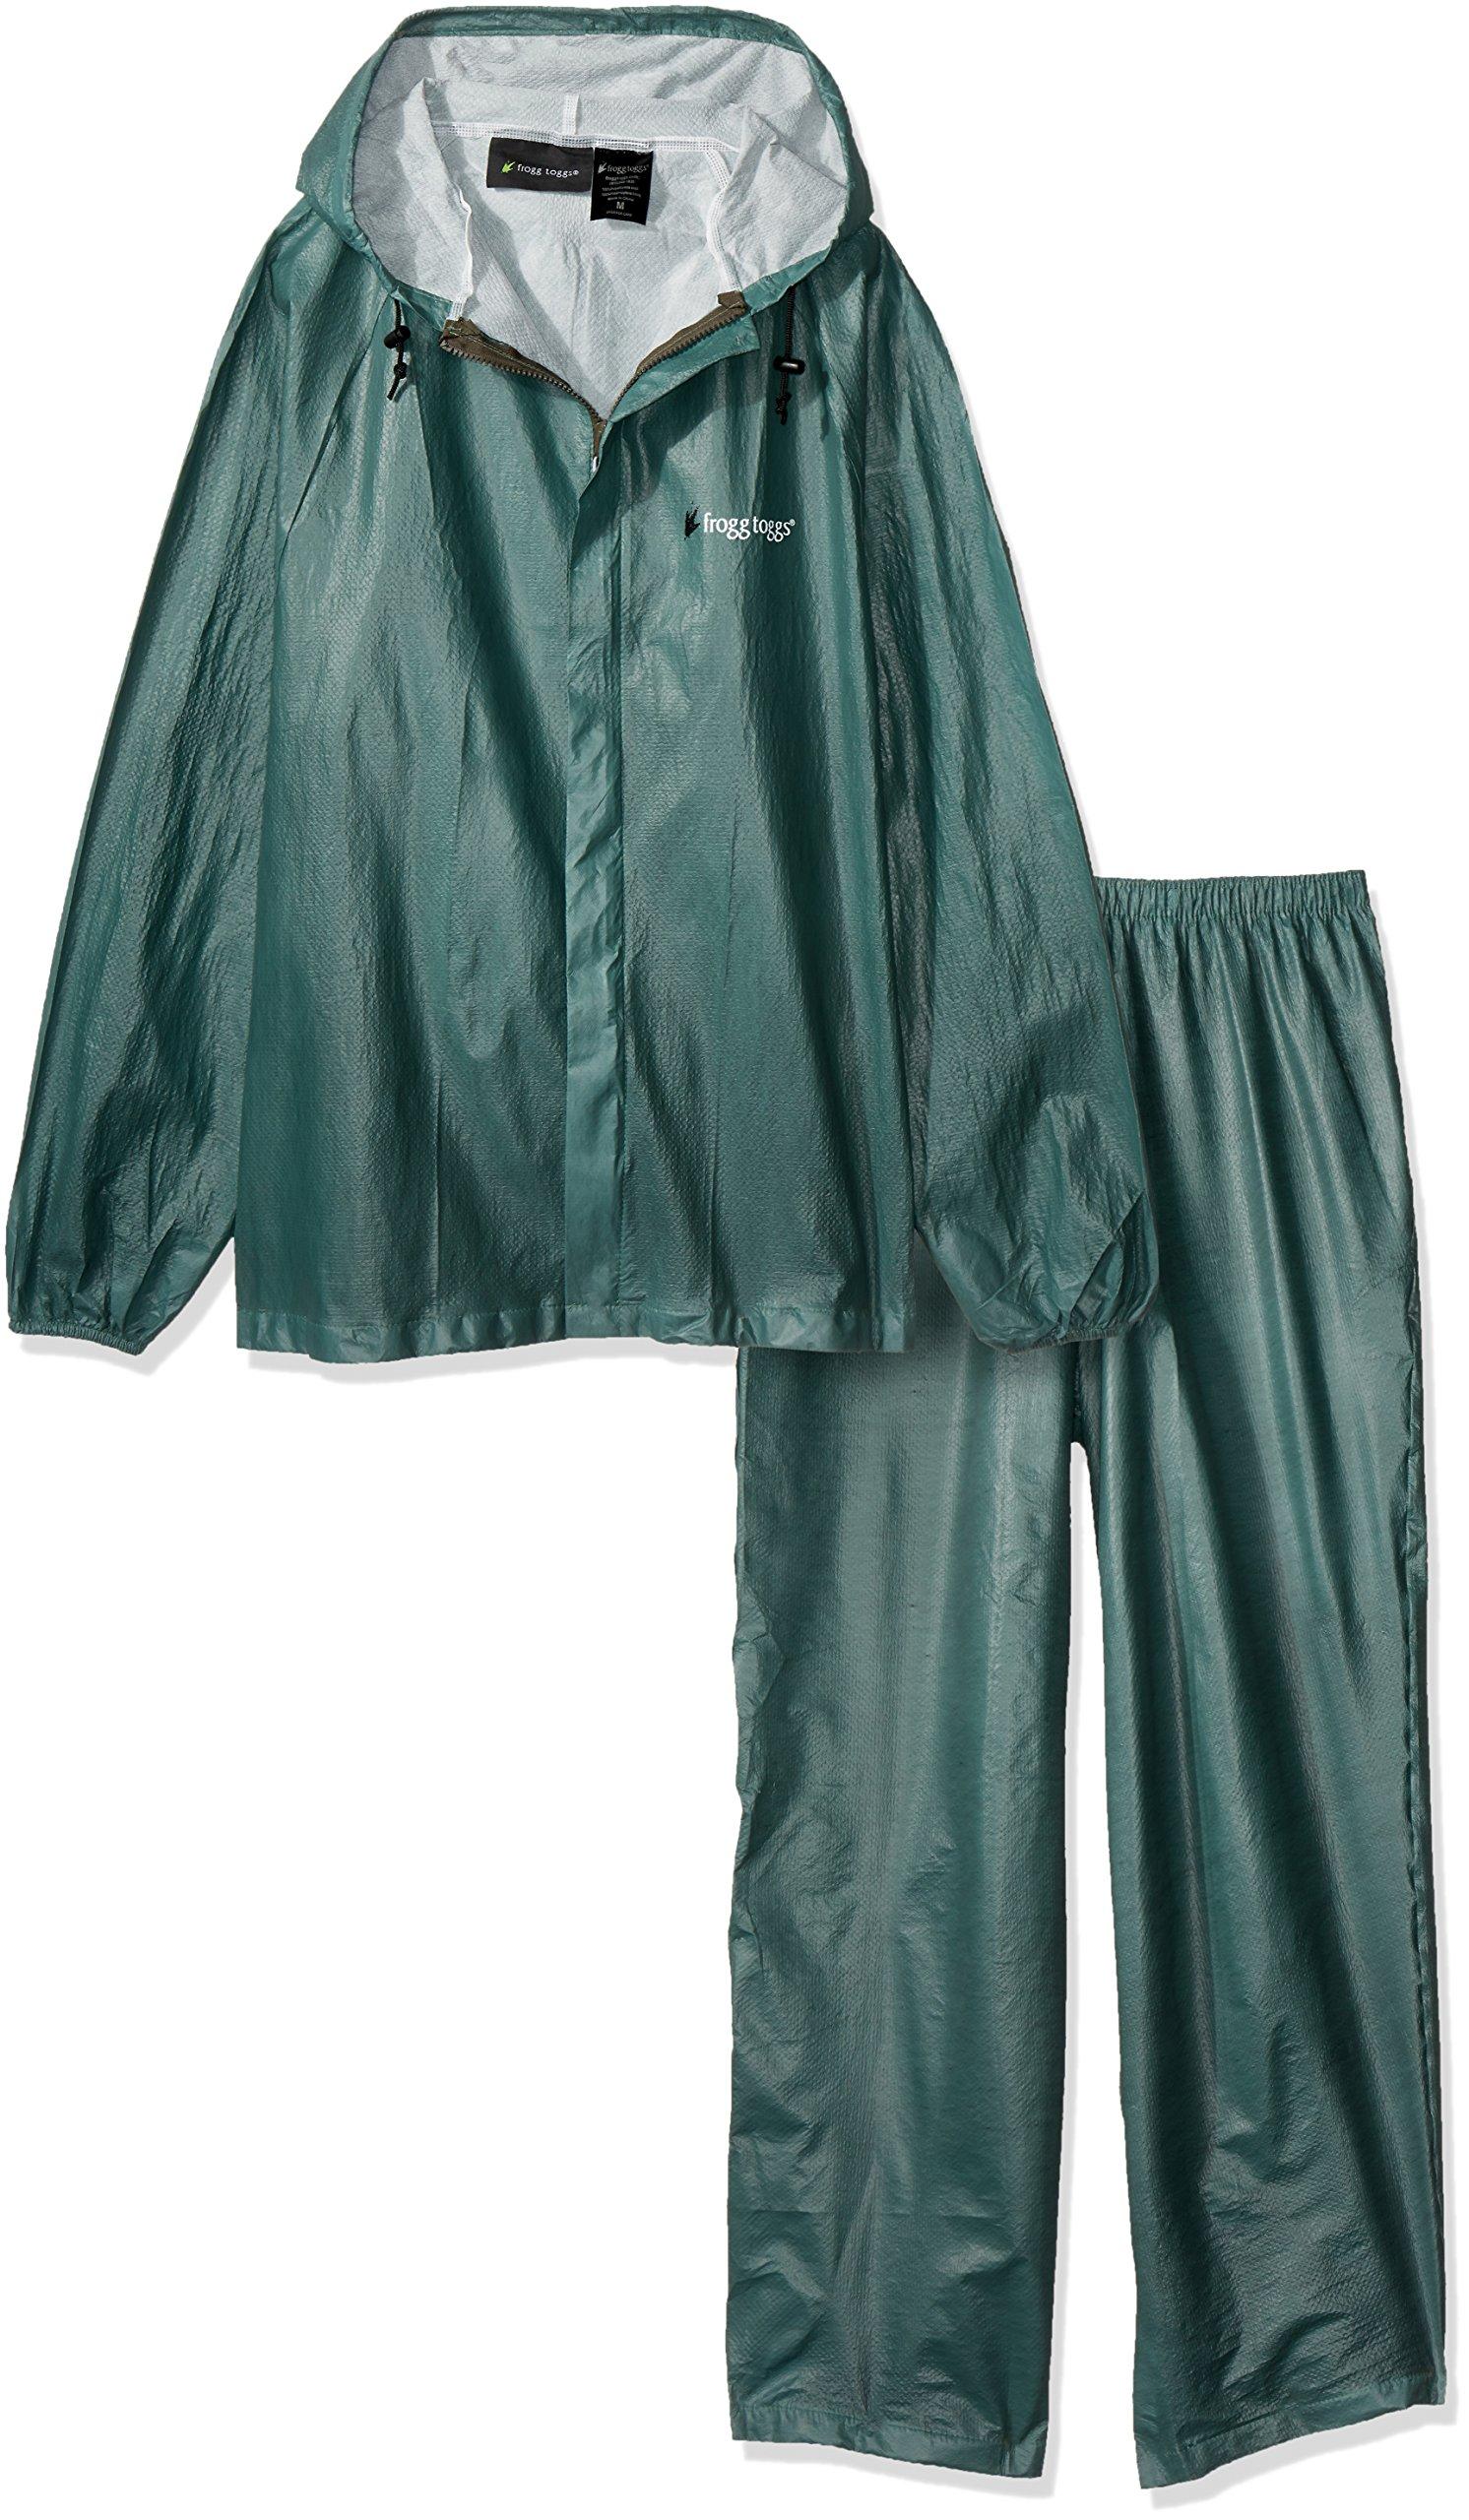 Frogg Toggs Ultra-lite2 Rain Suit W/stuff Sack - X-large, Royal Green